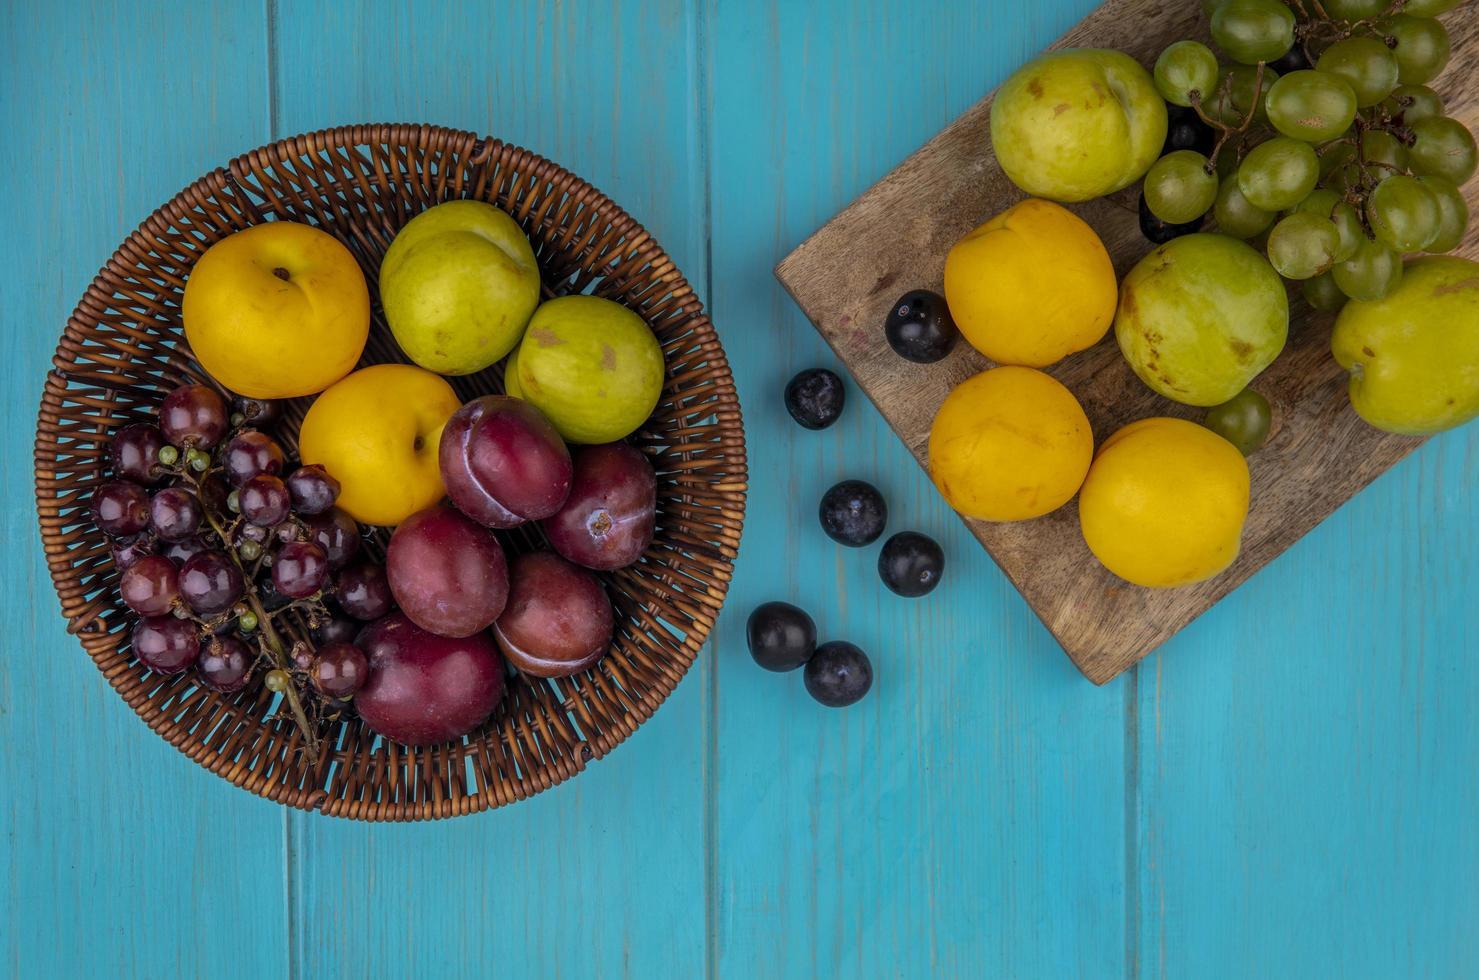 assortiment de fruits sur fond bleu photo